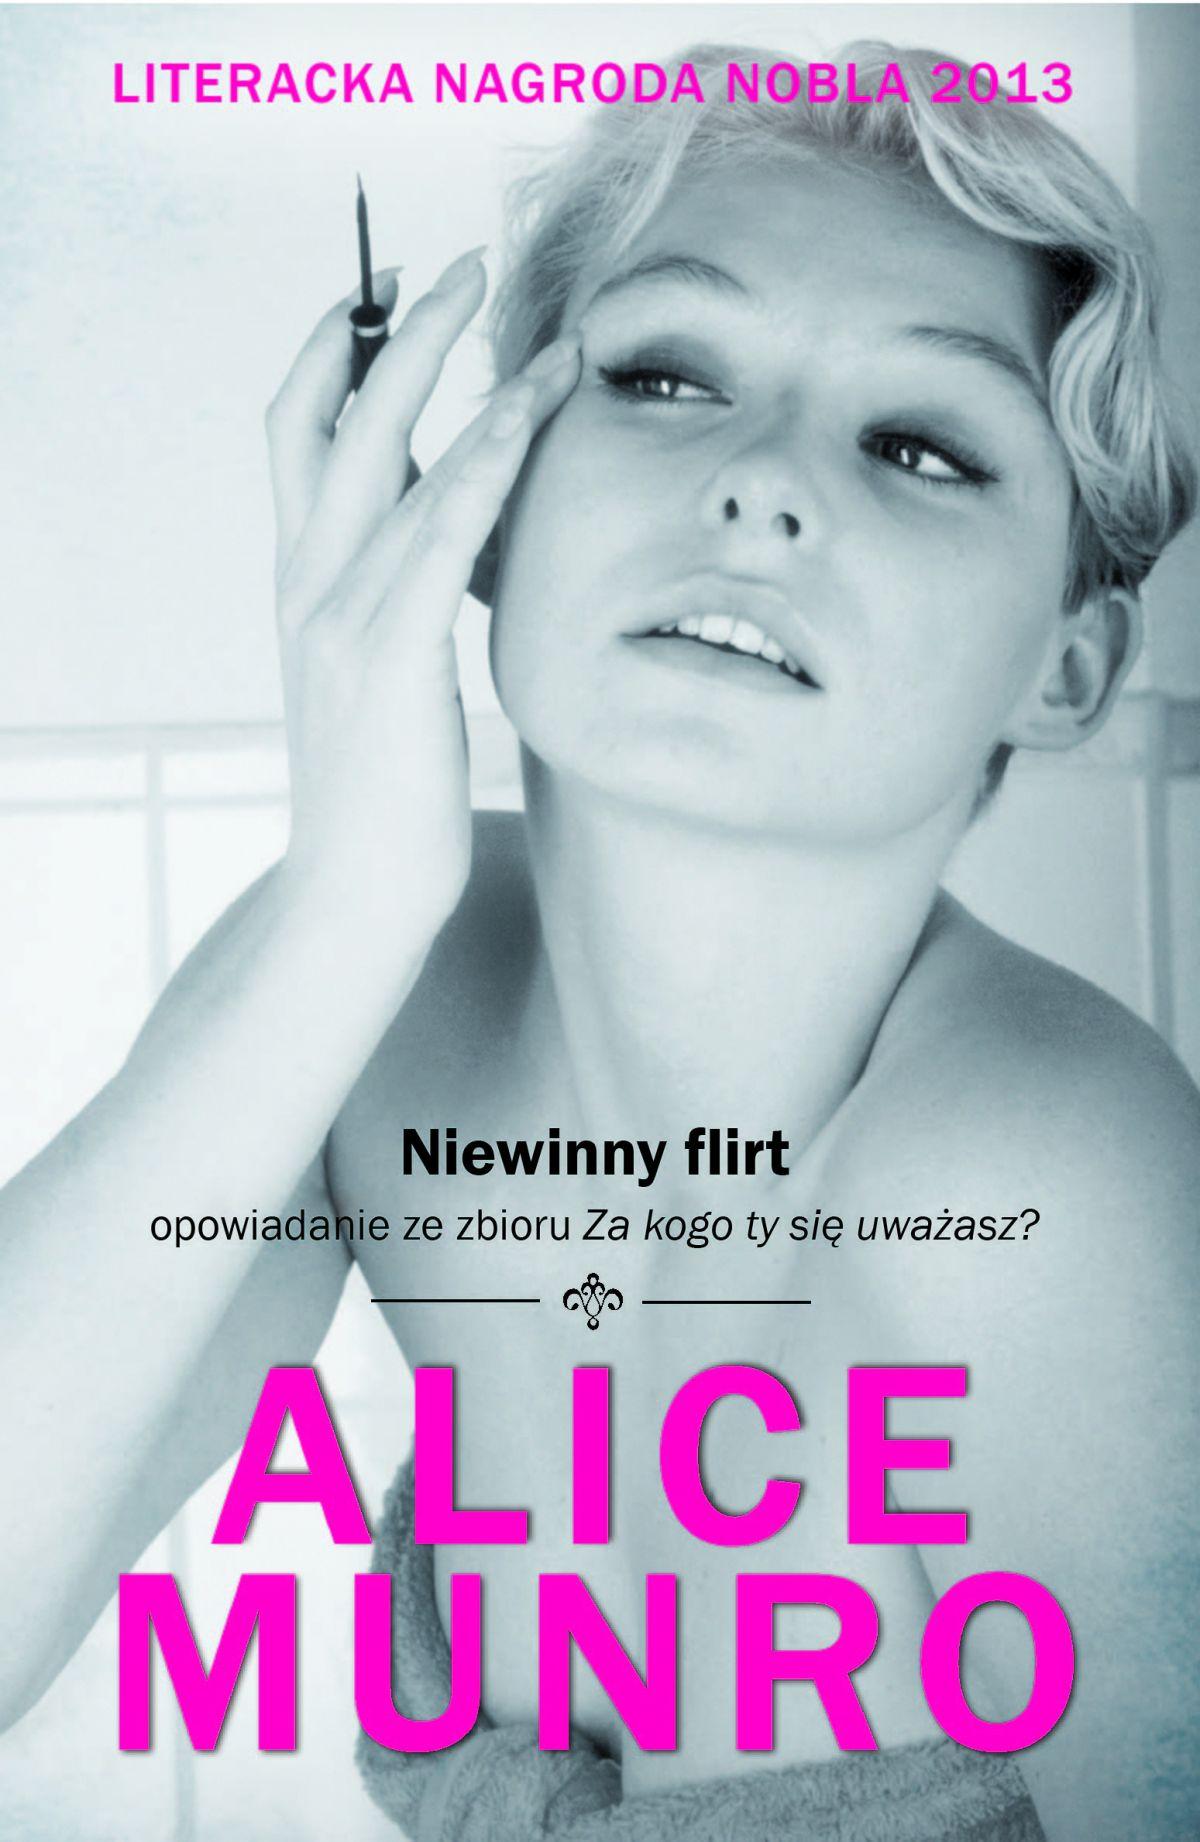 Alice Munro Epub